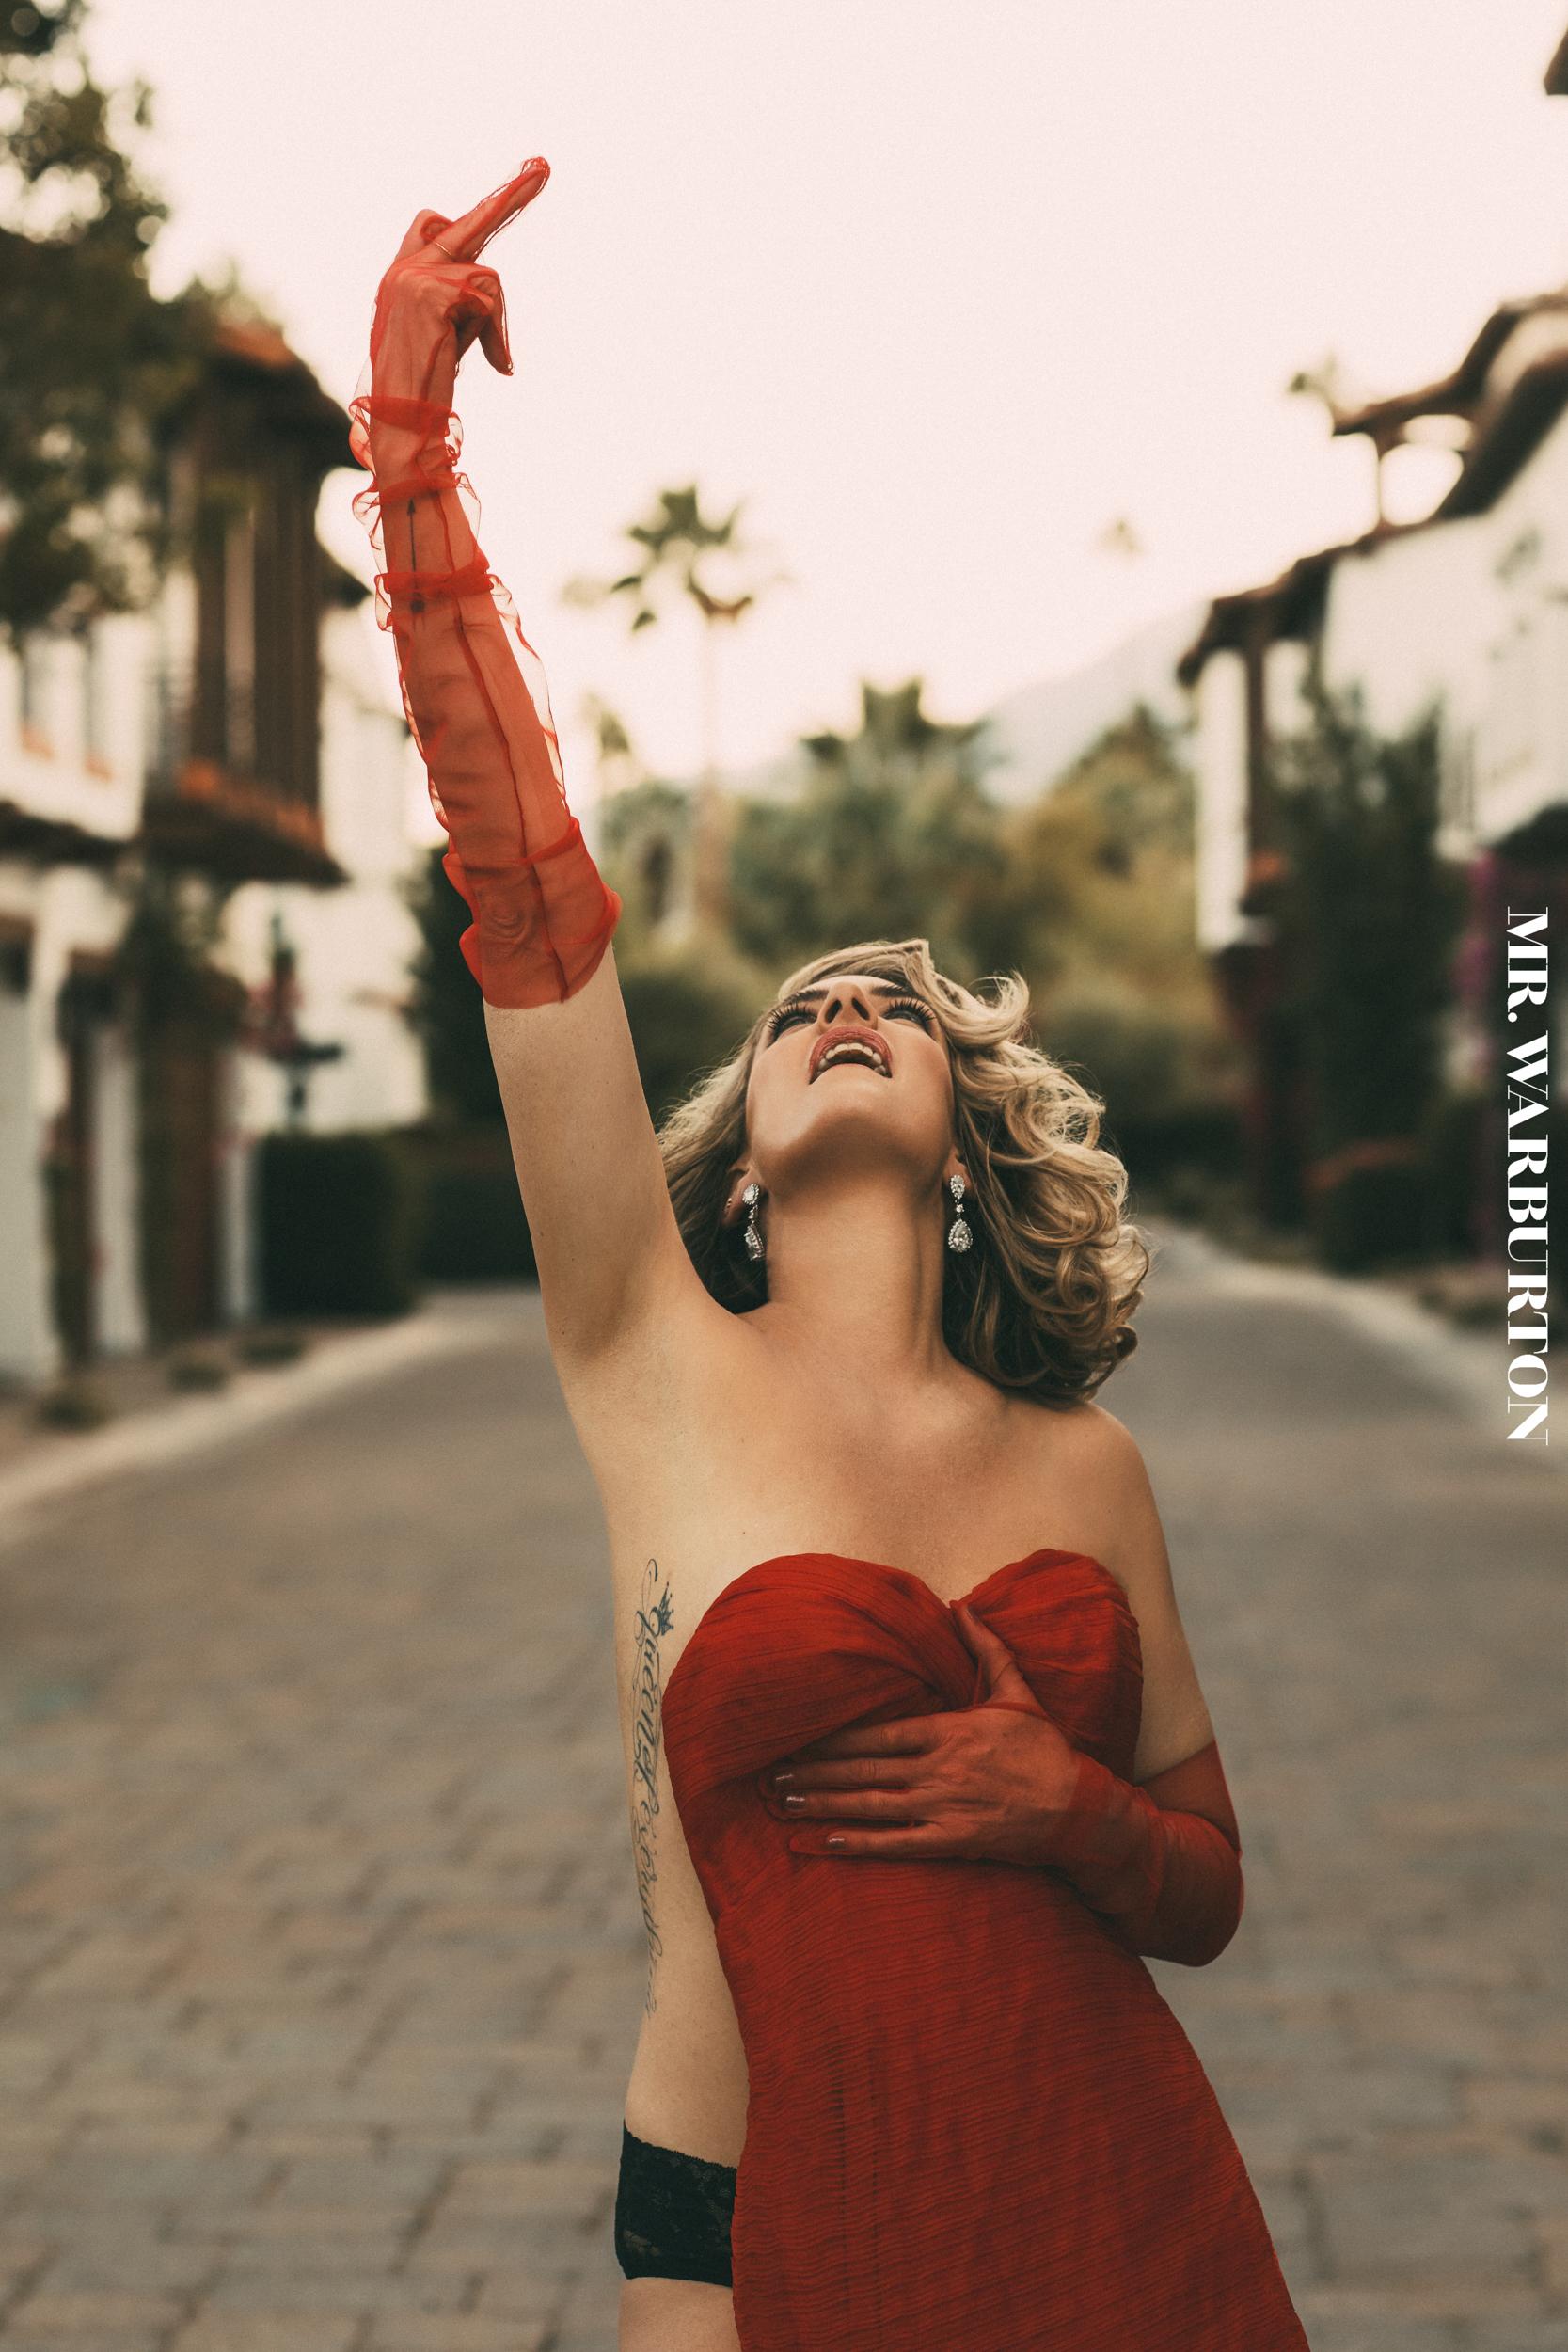 Amick Madchen Nude actress mädchen amick, body of work – mrwarburtonmagazine